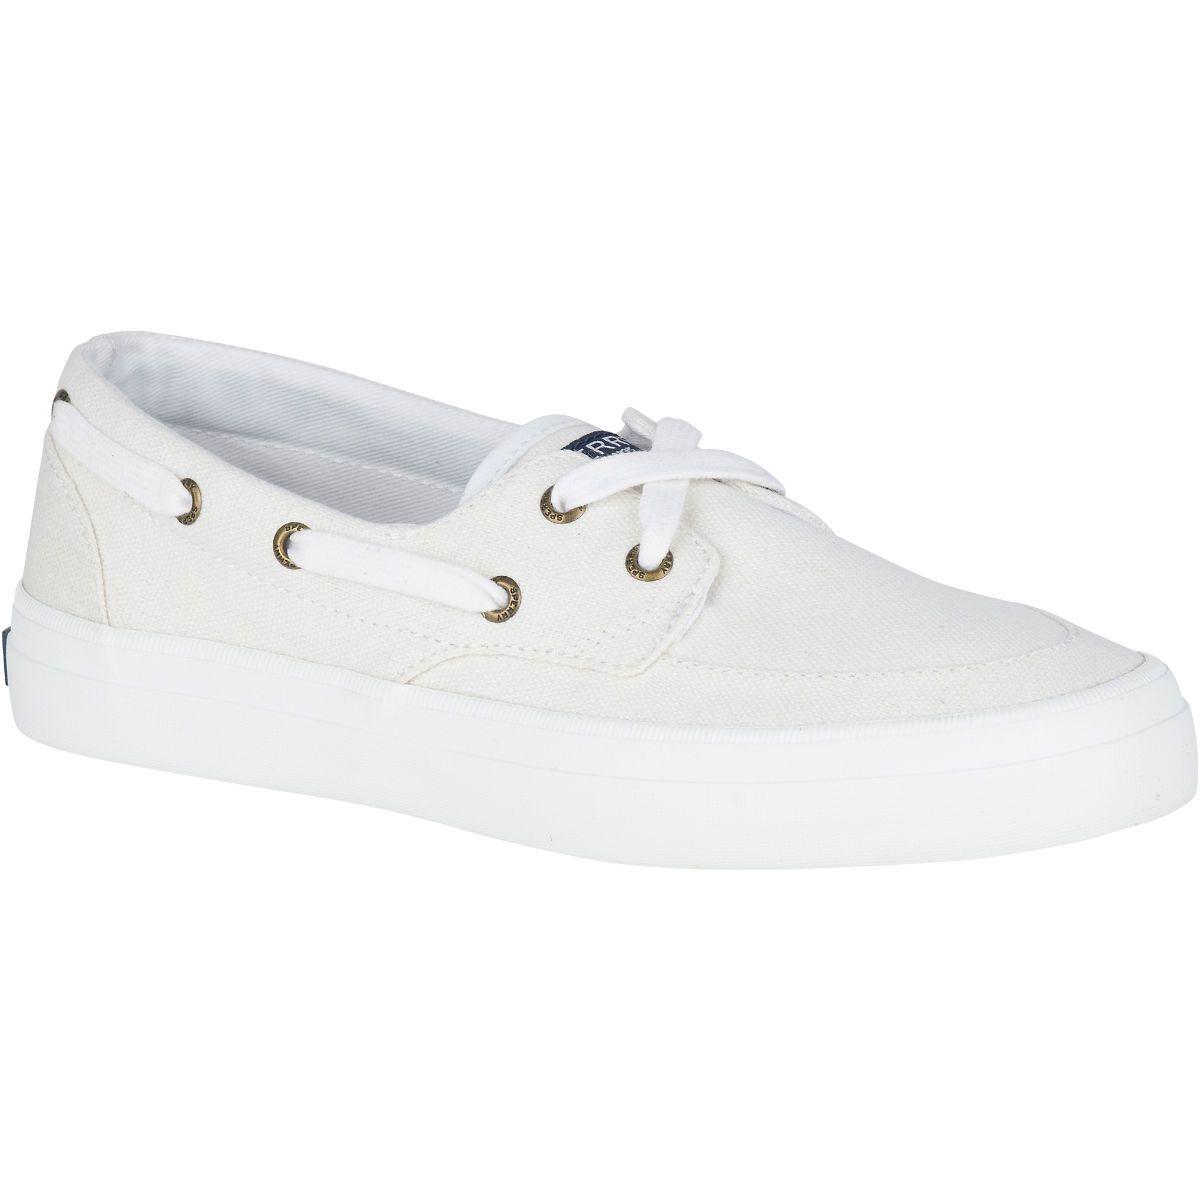 Women's Crest Boat Shoe | Boat shoes, Adidas shoes women